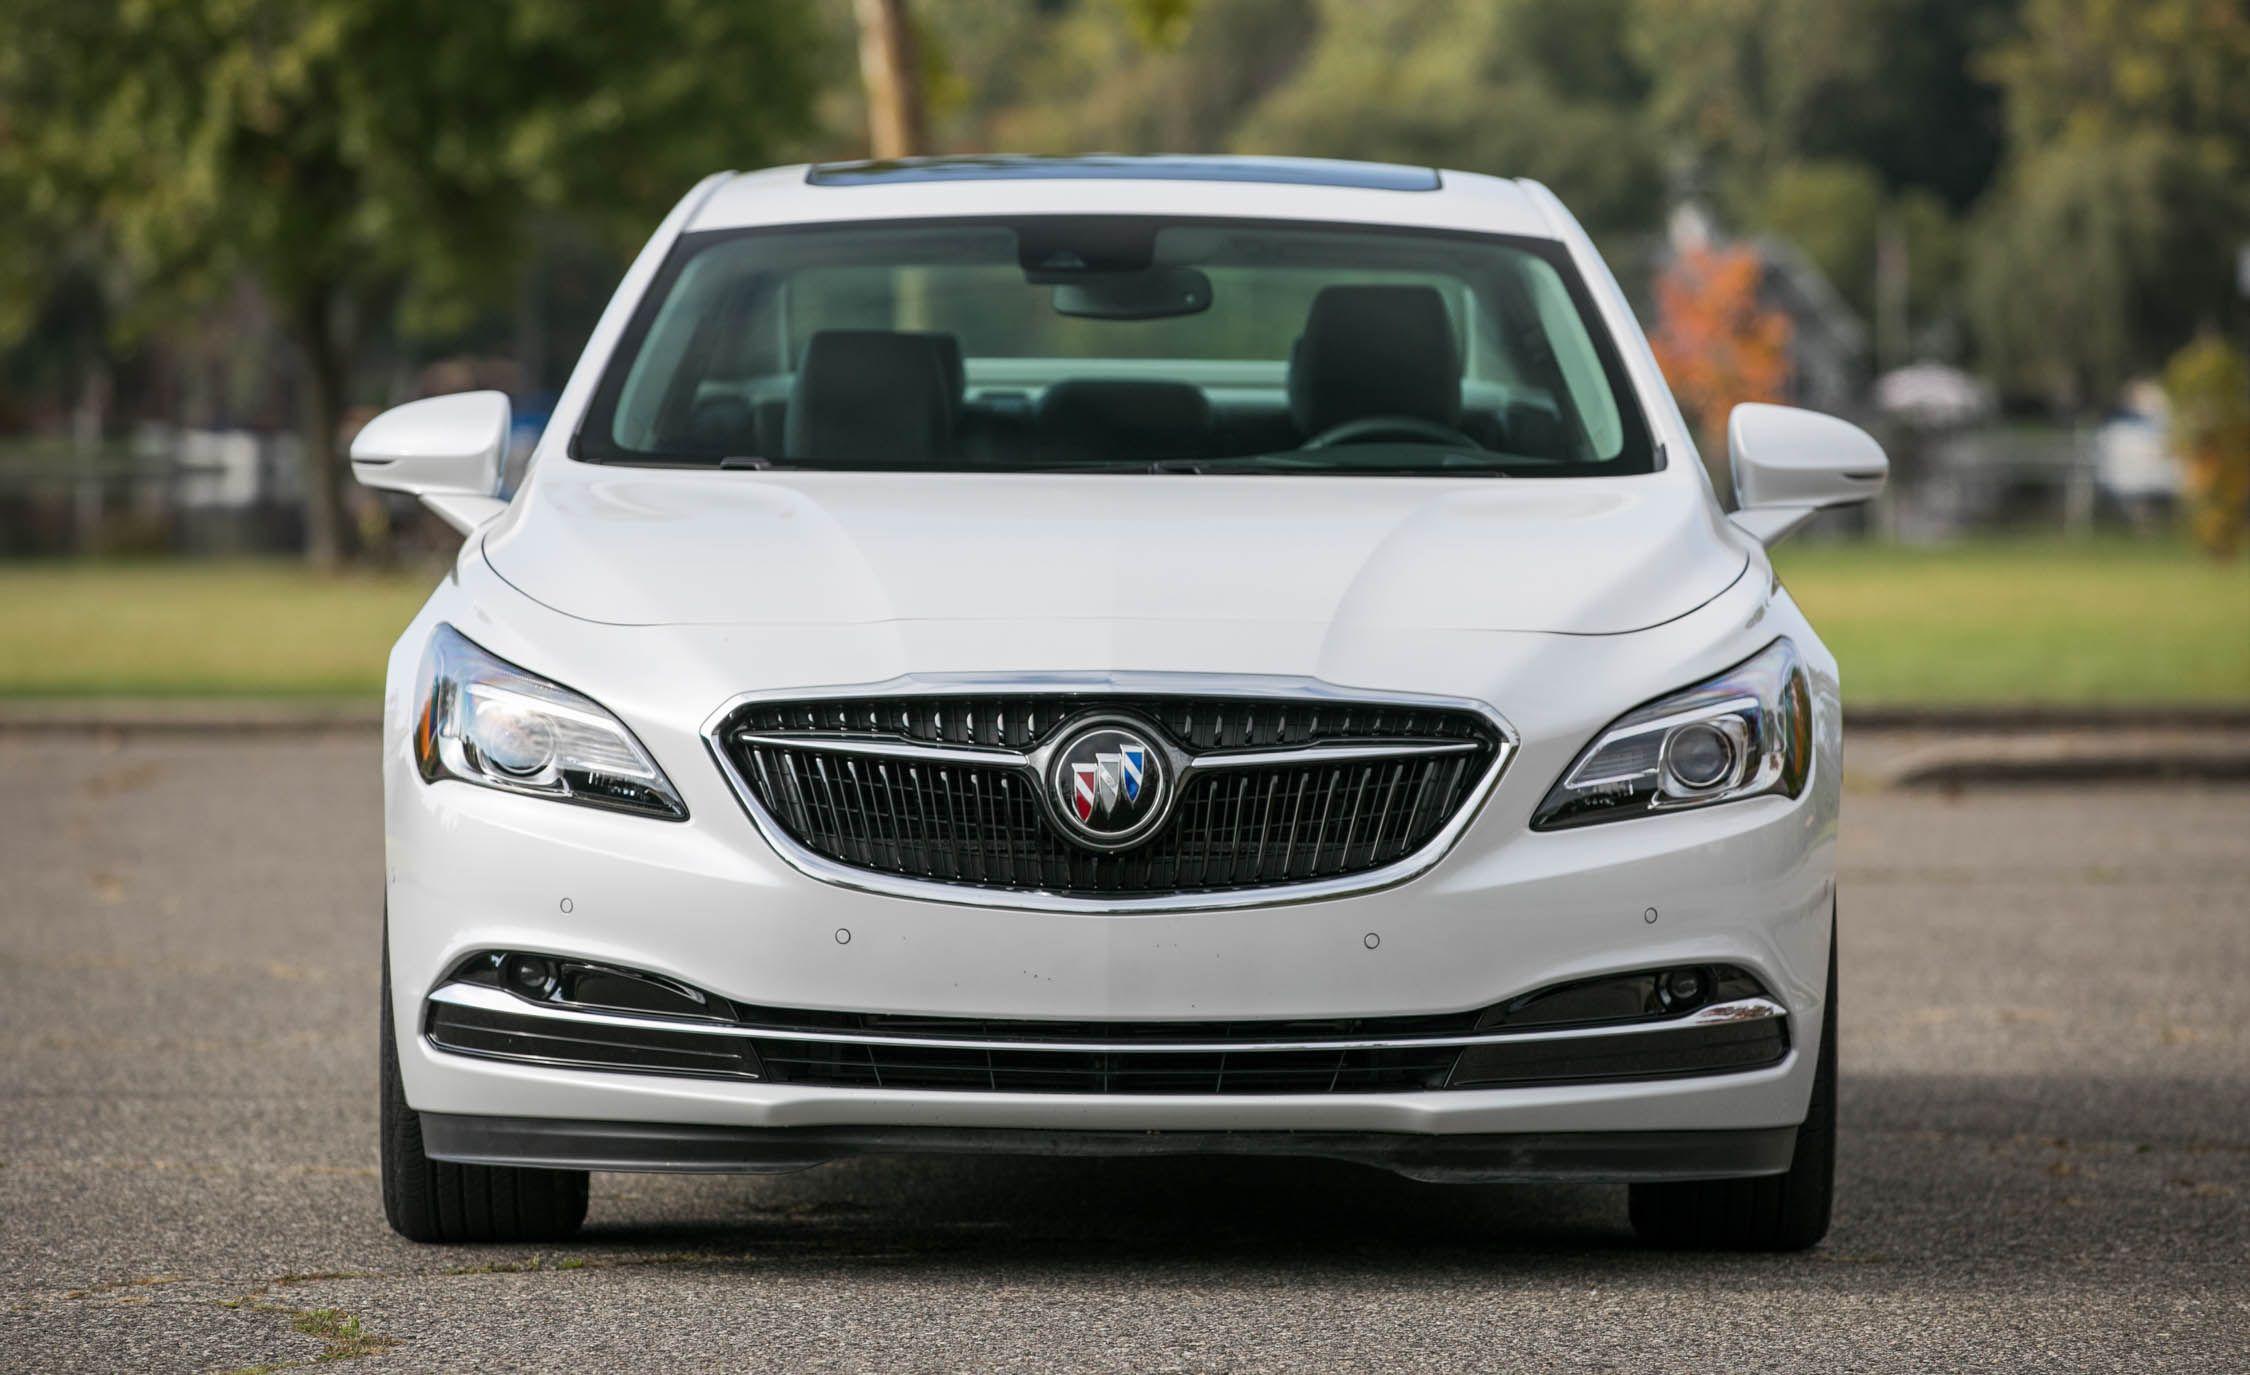 Buick LaCrosse: Infotainment System Menus